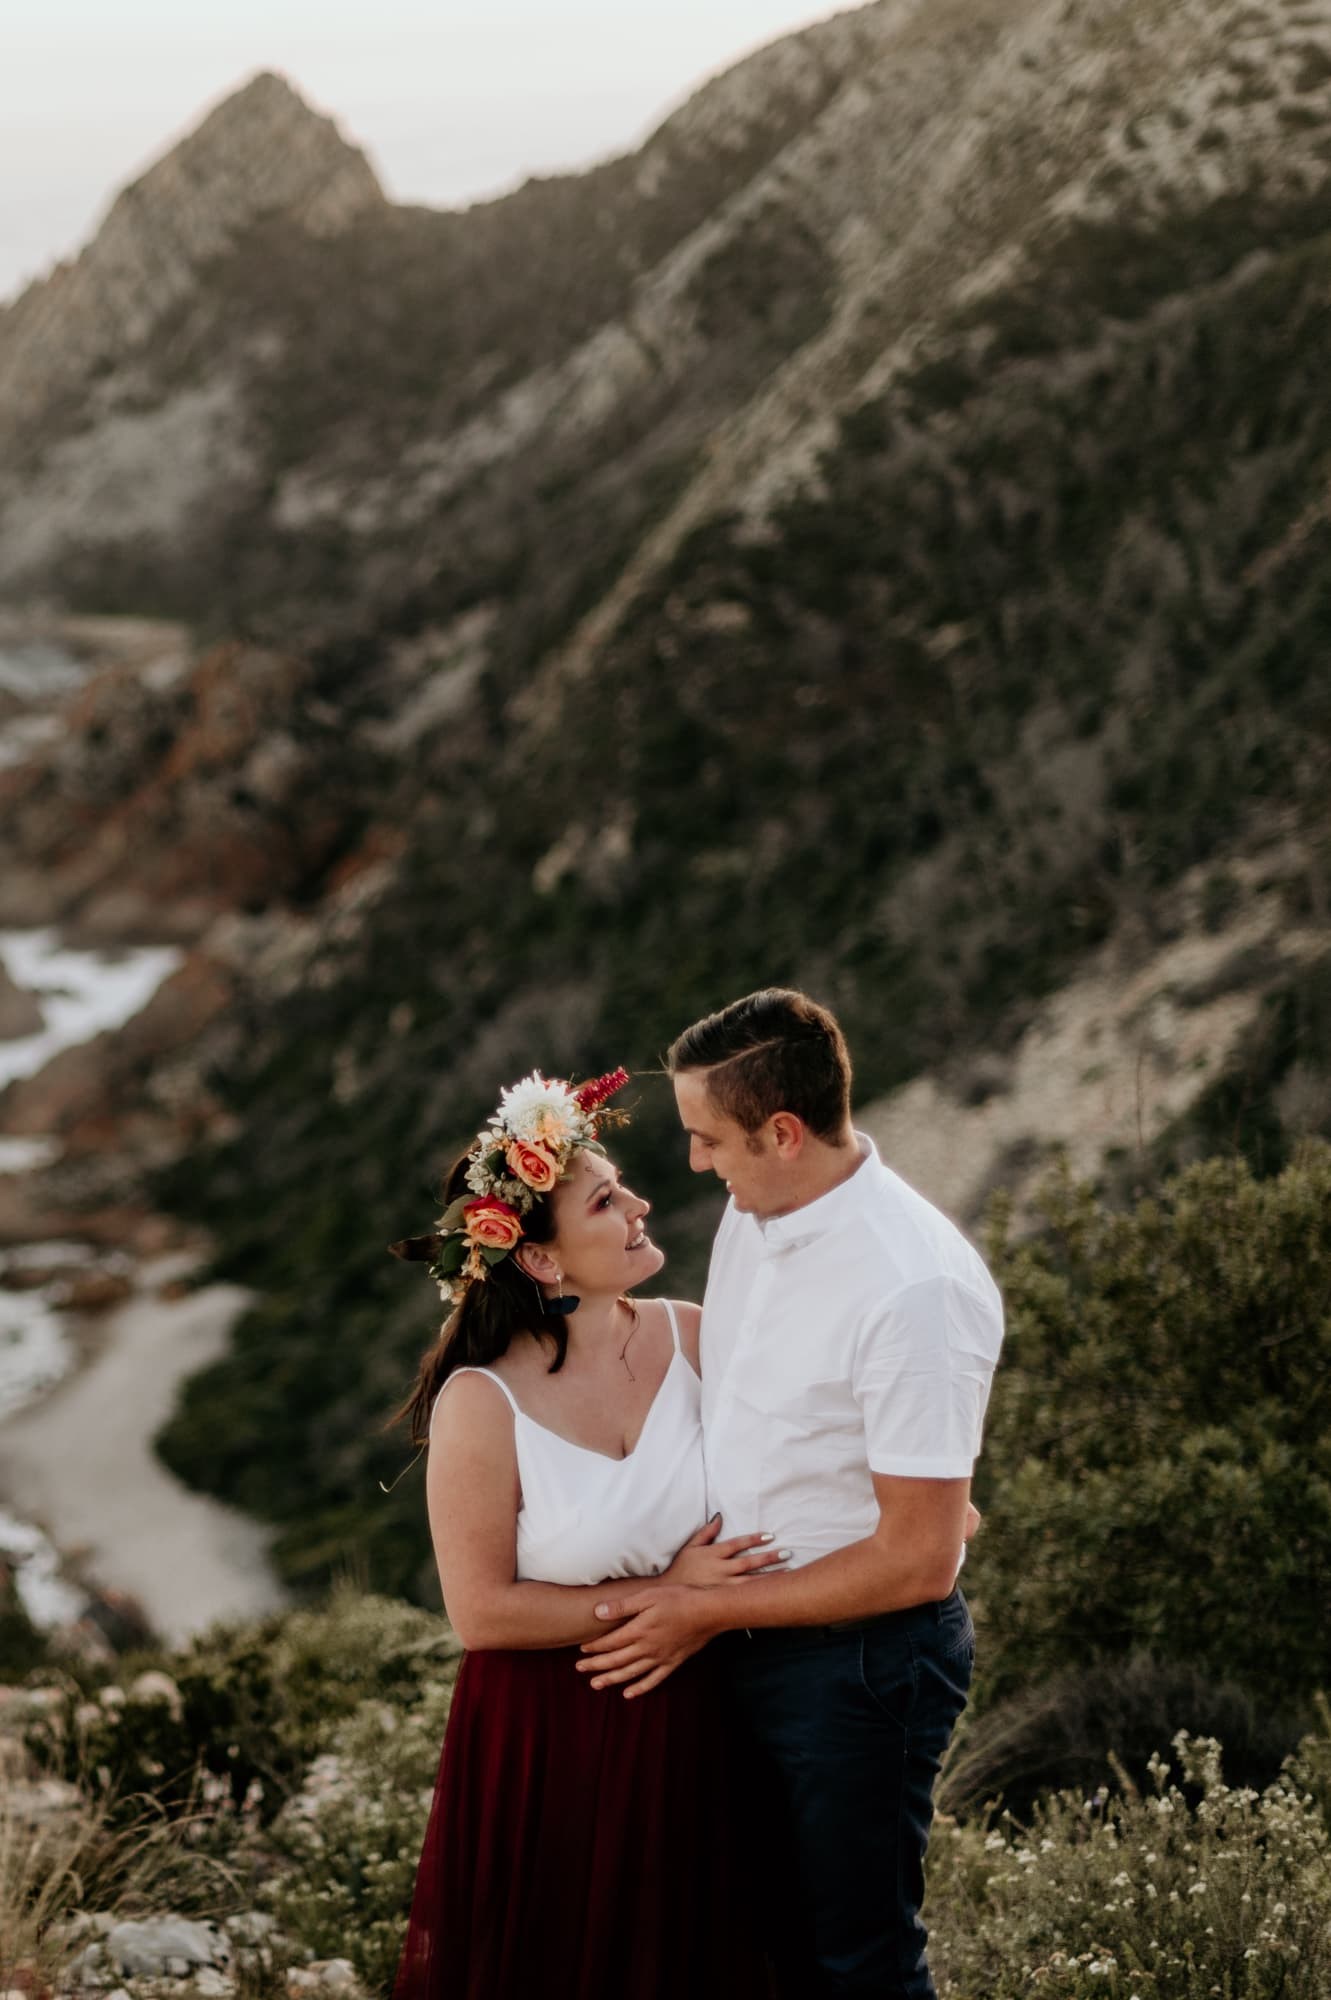 jesann-freddie-kranshoek-engagement-June-Richards-Photography-Destination-Weddings-Elopements-Garden-Route-33